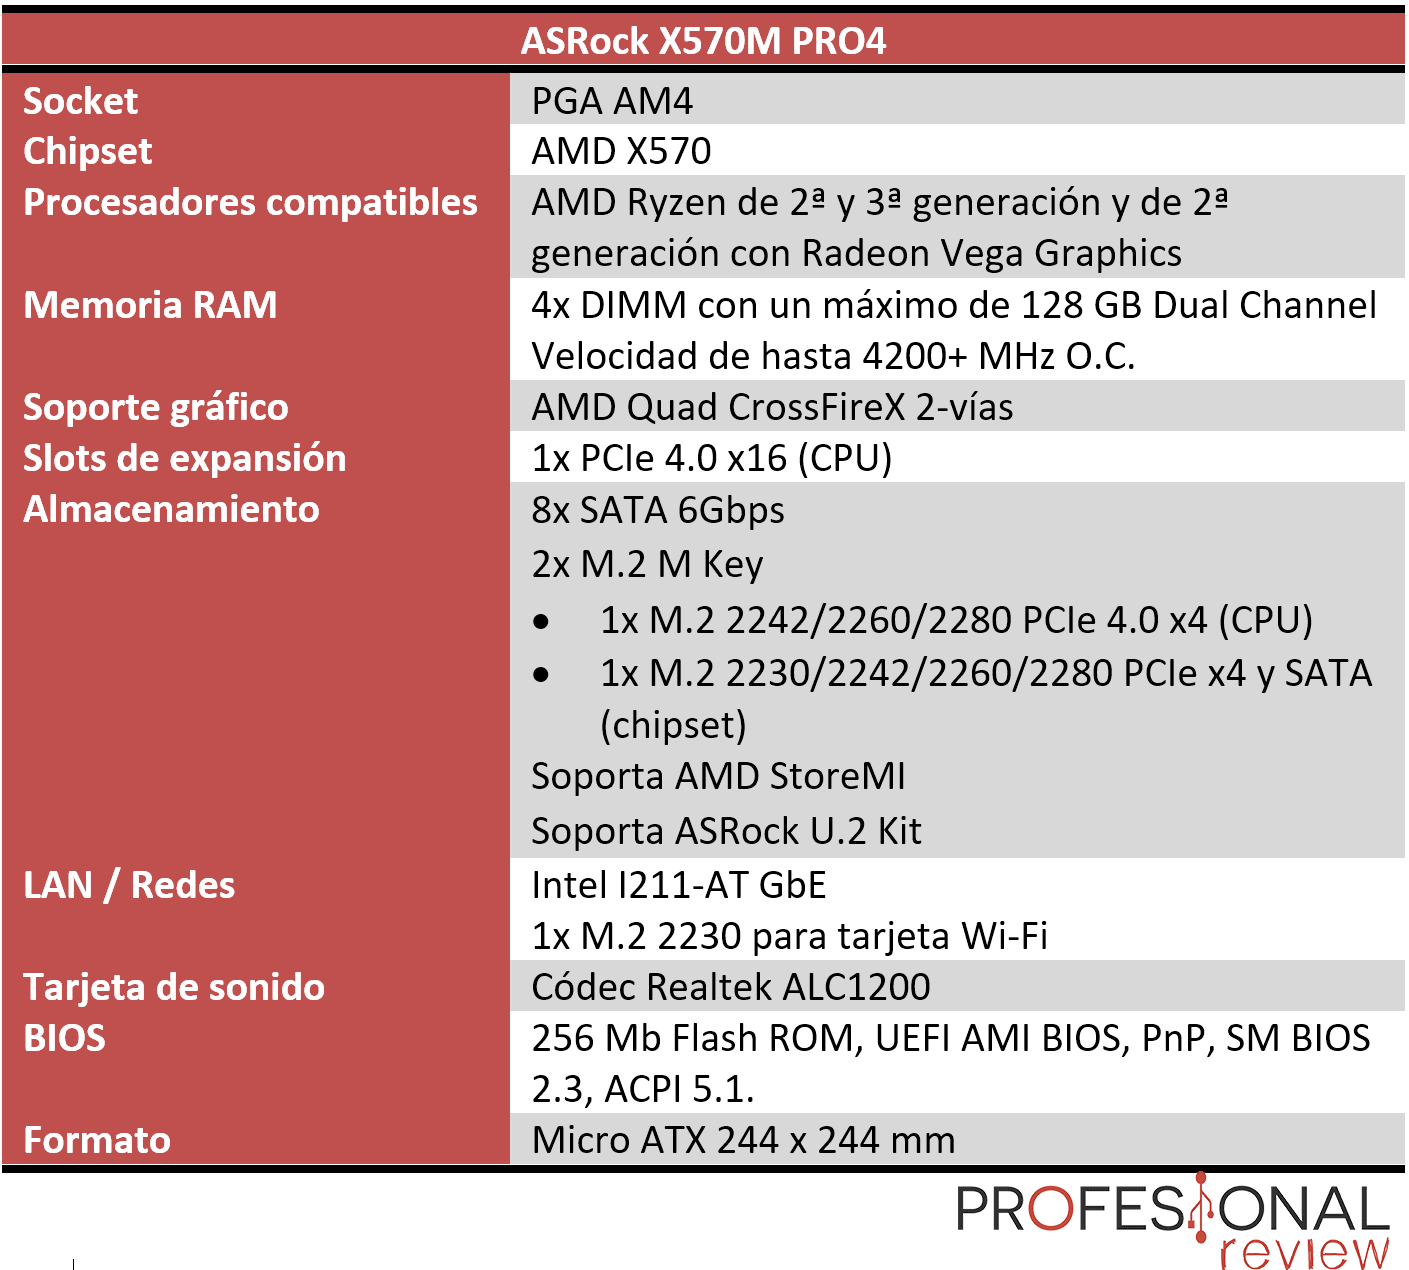 ASRock X570M PRO4 Características